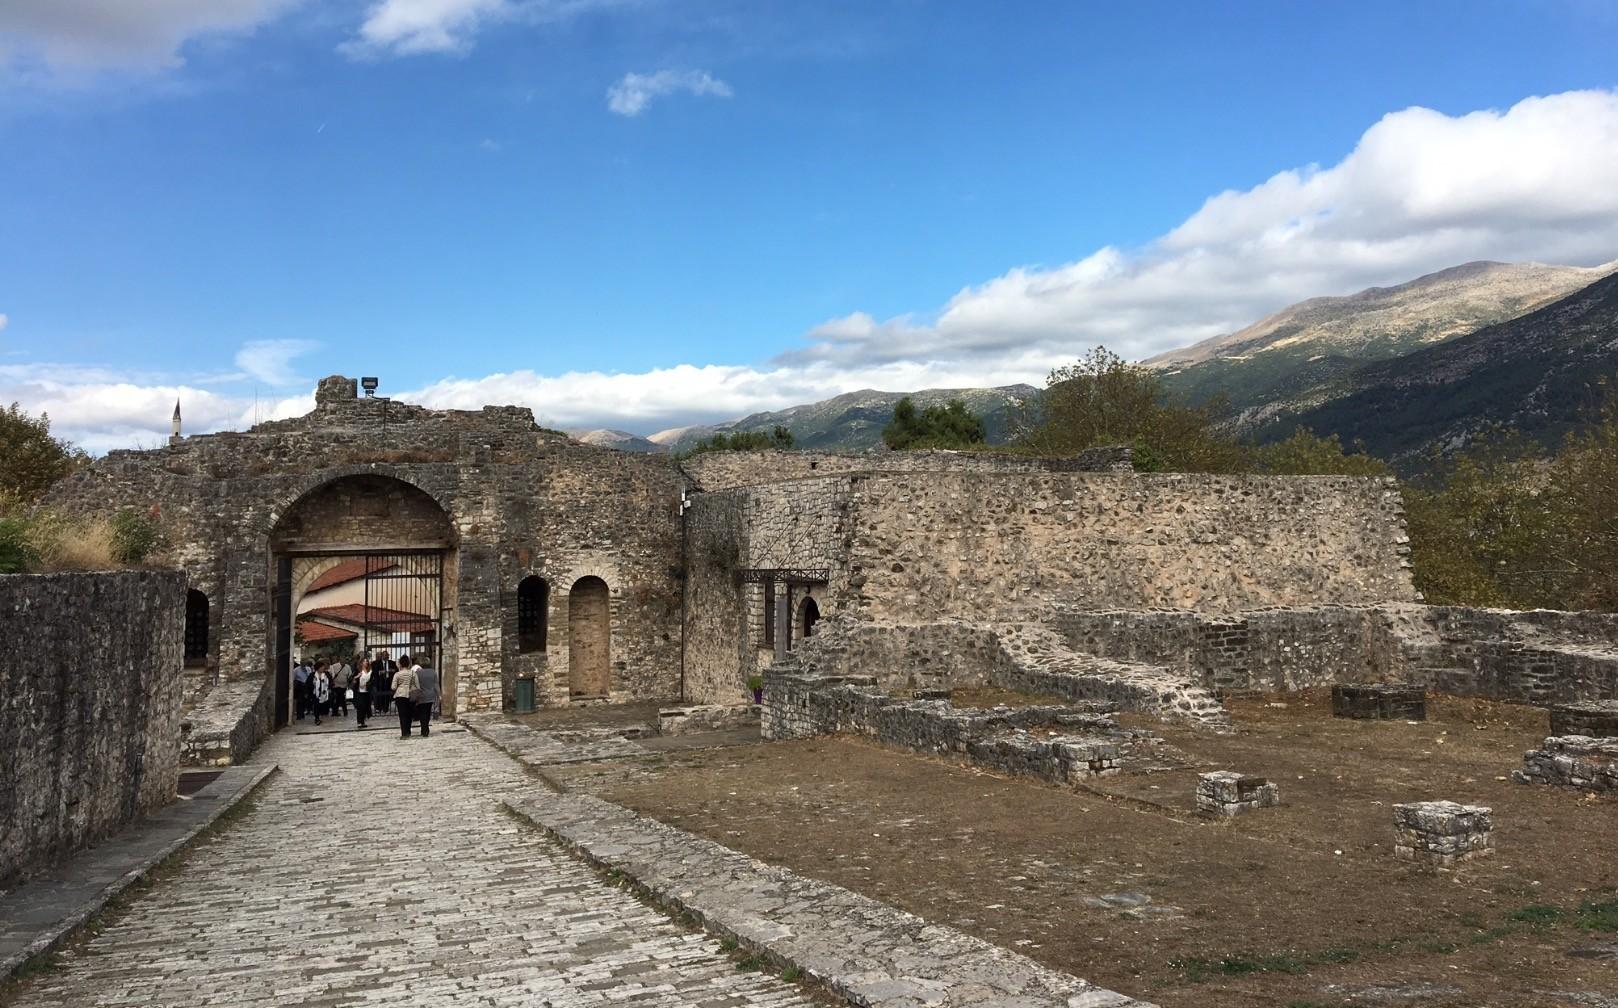 The Ottoman gate entranceway to the seraglio district that Evliya u00c7elebi describes in his 1670 visit to Ioannina as one of the four Muslim negihborhoods.